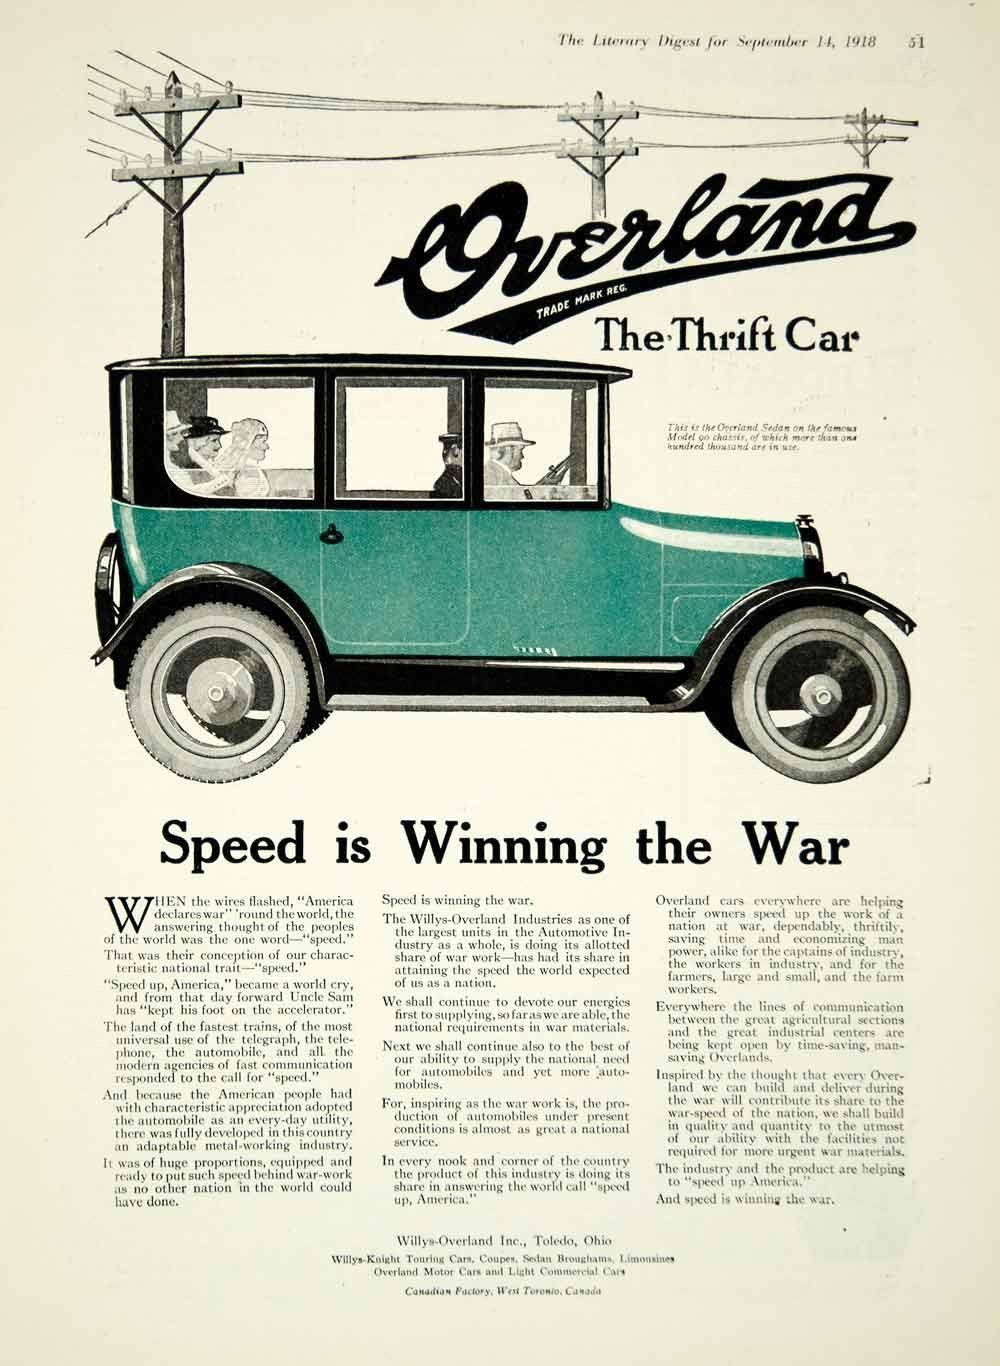 1918 Ad Sedan Thrift Car Willys Overland Incorporated Toledo Ohio